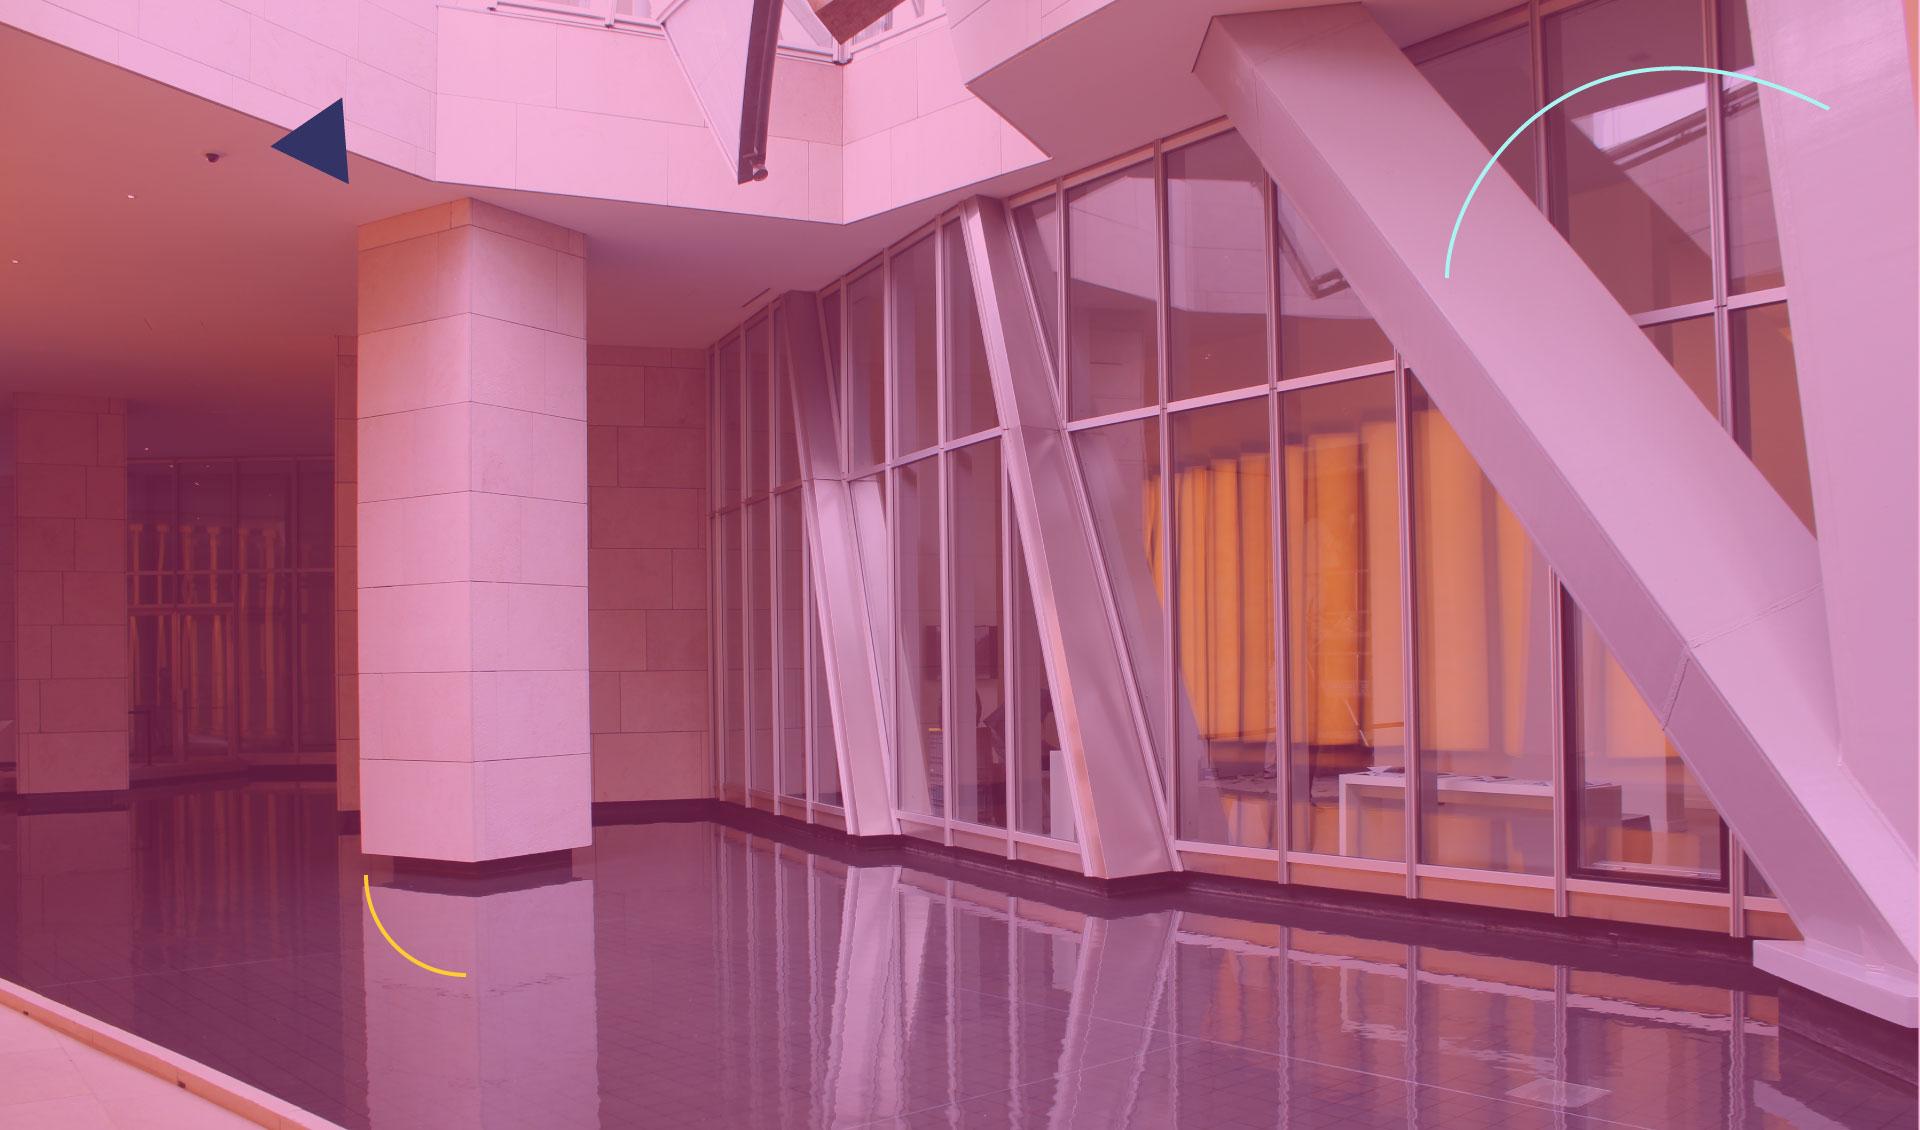 Summer Nights Studio SEO and Digital Marketing Consultant - Paris Art Gallery